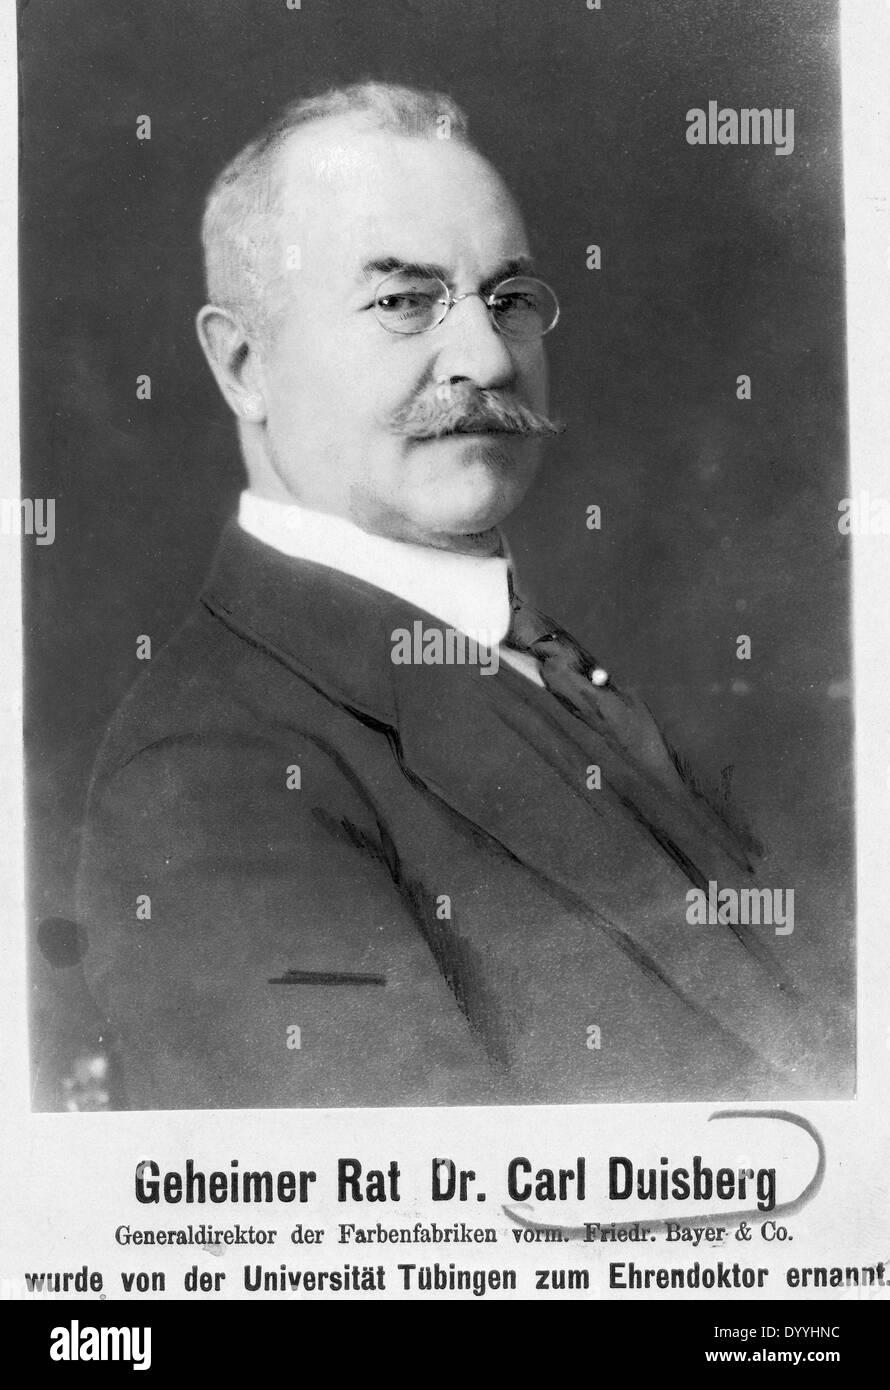 Dr. Carl Duisberg - Stock Image